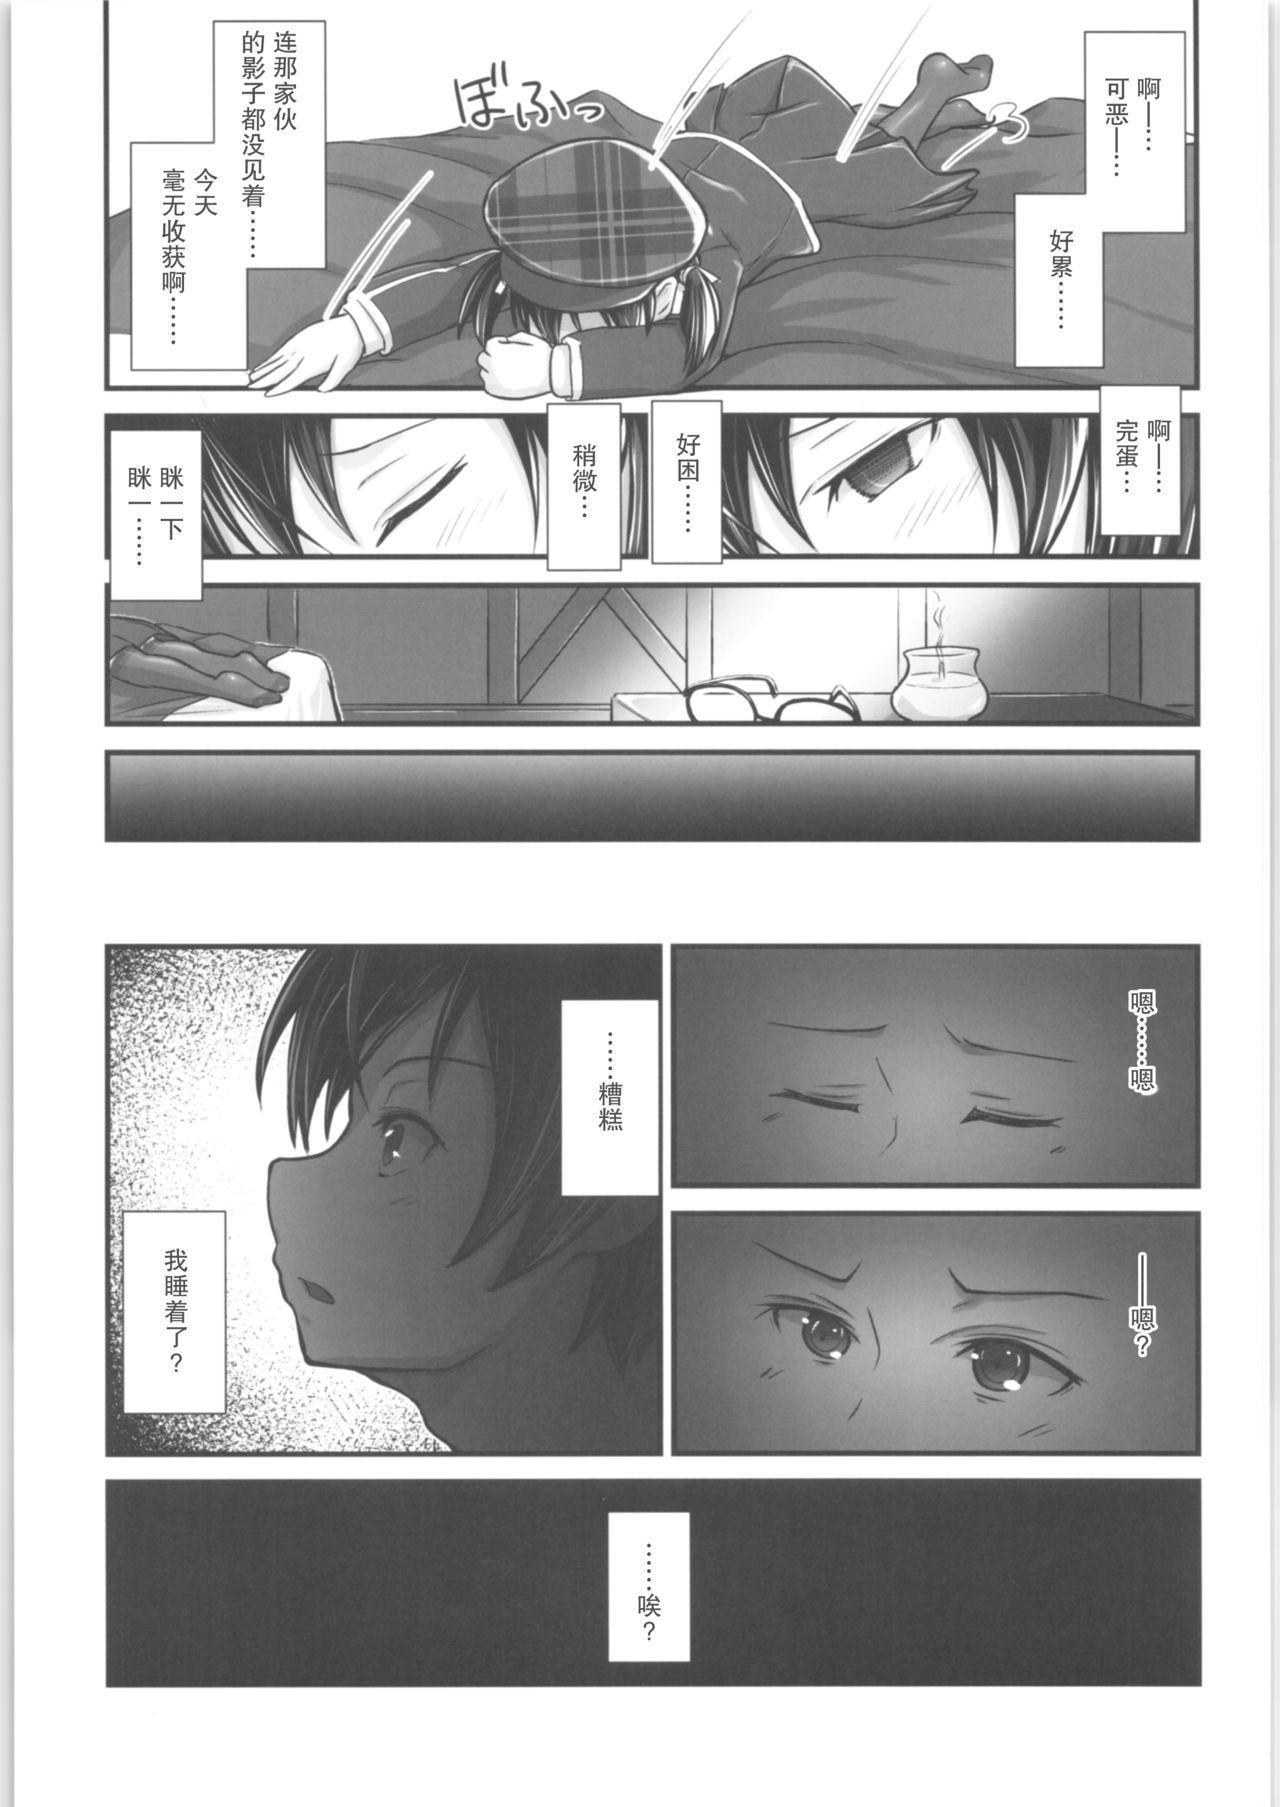 [Umari-ya (D-2)] Kiriko Route Another #05 ~Seifuku Josou Anal Junchi Hen~ (Sword Art Online) ) [Chinese] [不可视汉化] 16